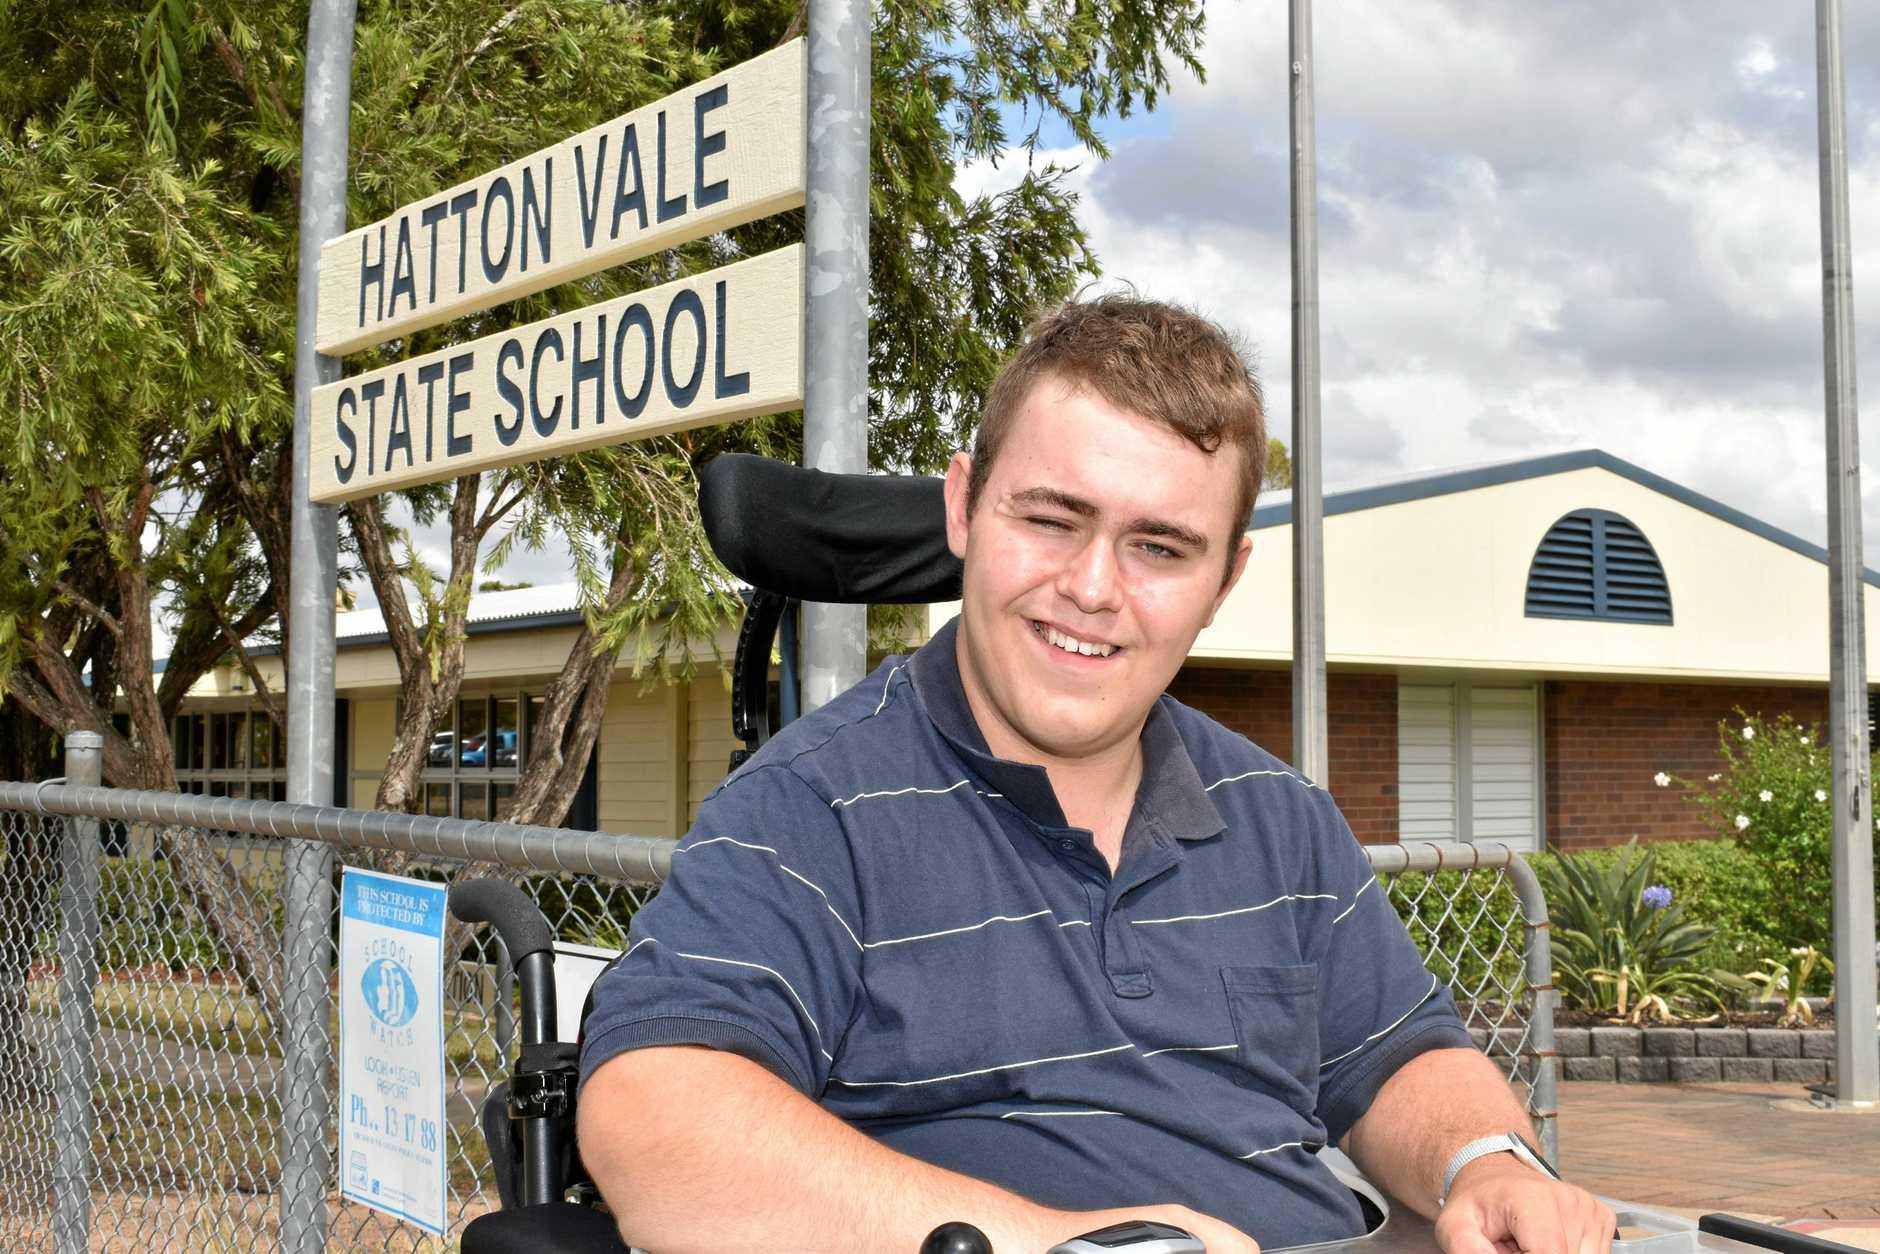 Lochlan Thomas at Hatton Vale State School on January 30.